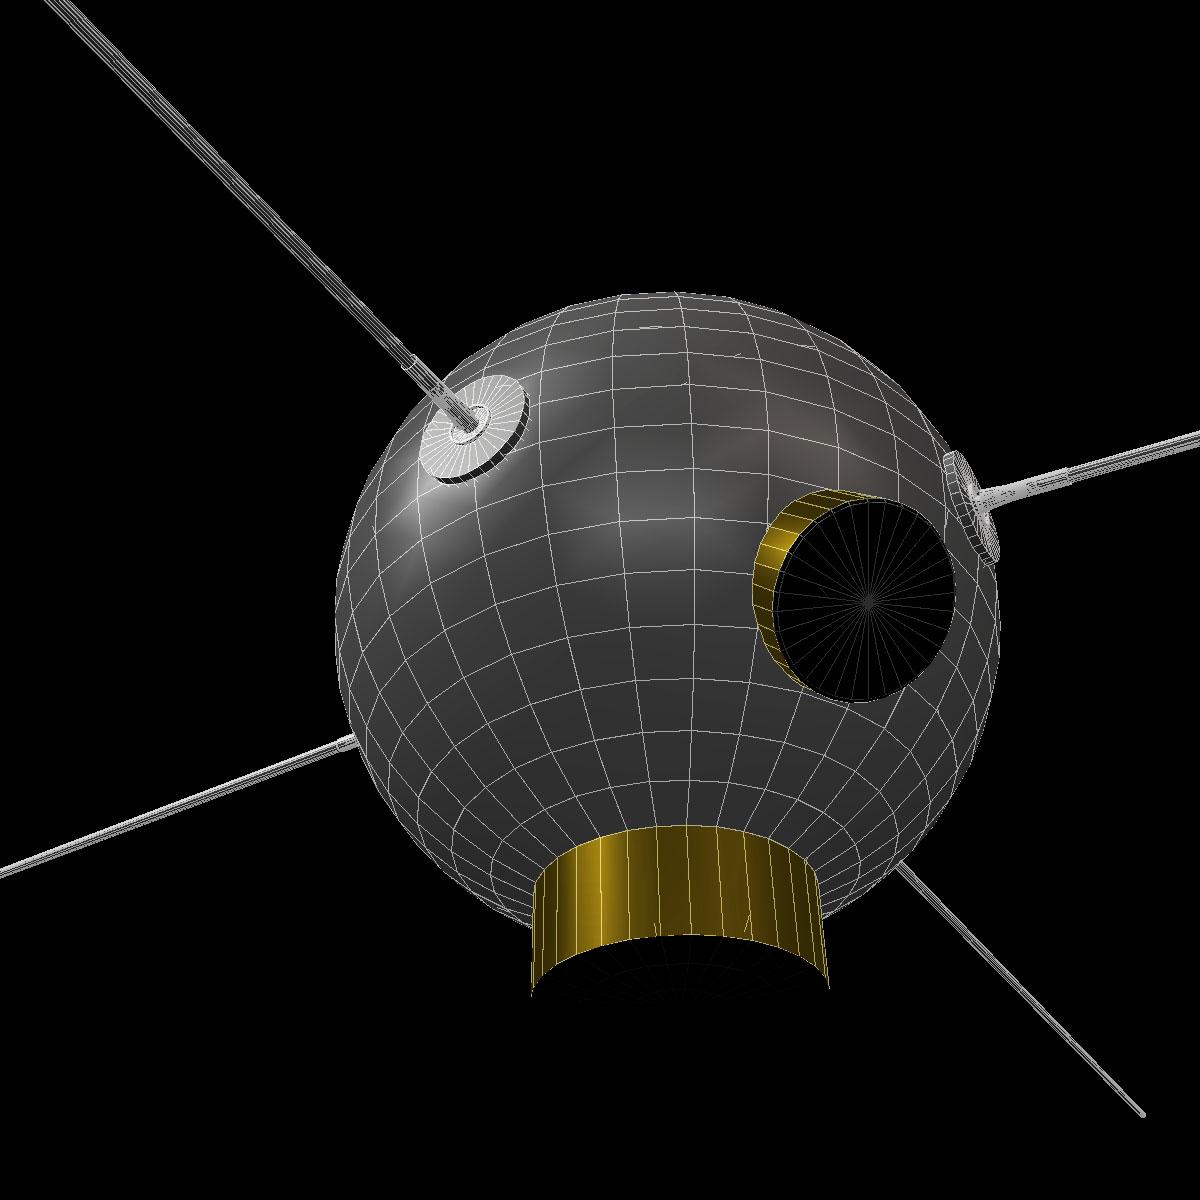 avangard ii satelit 3d model 3ds dxf fbx mješavina cob dae x obj 163944